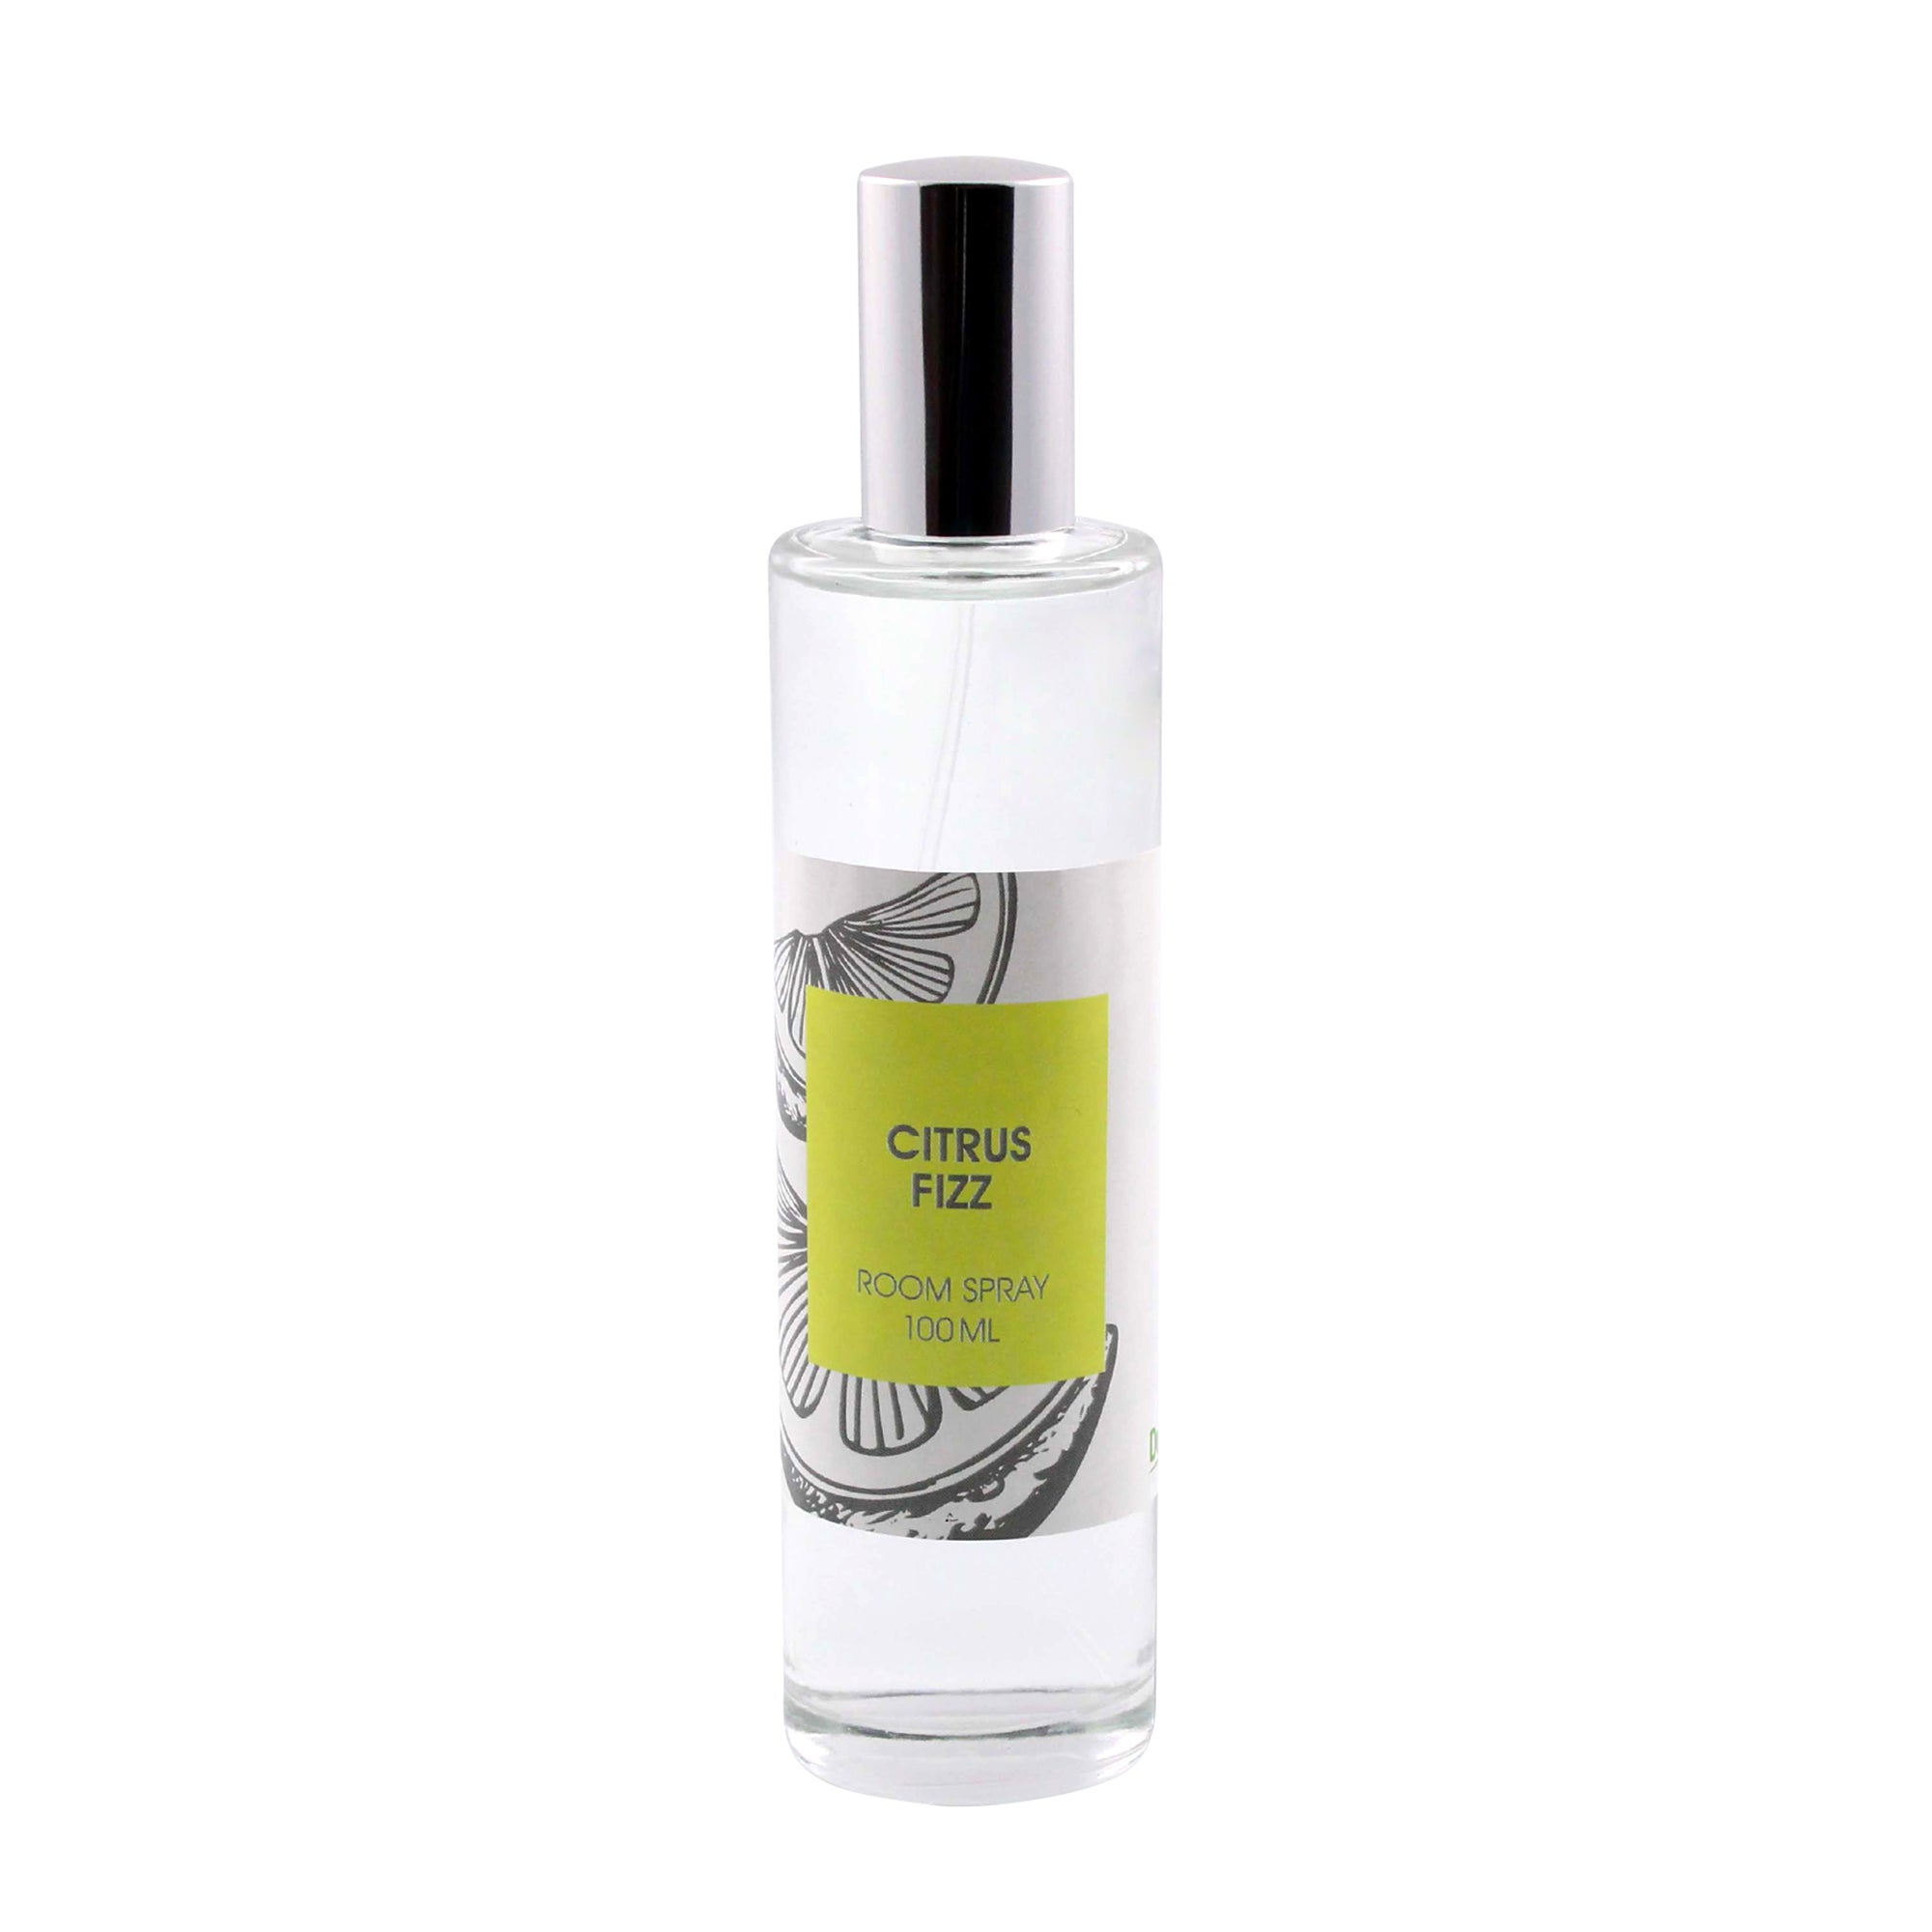 Citrus Fizz 100ml Room Spray